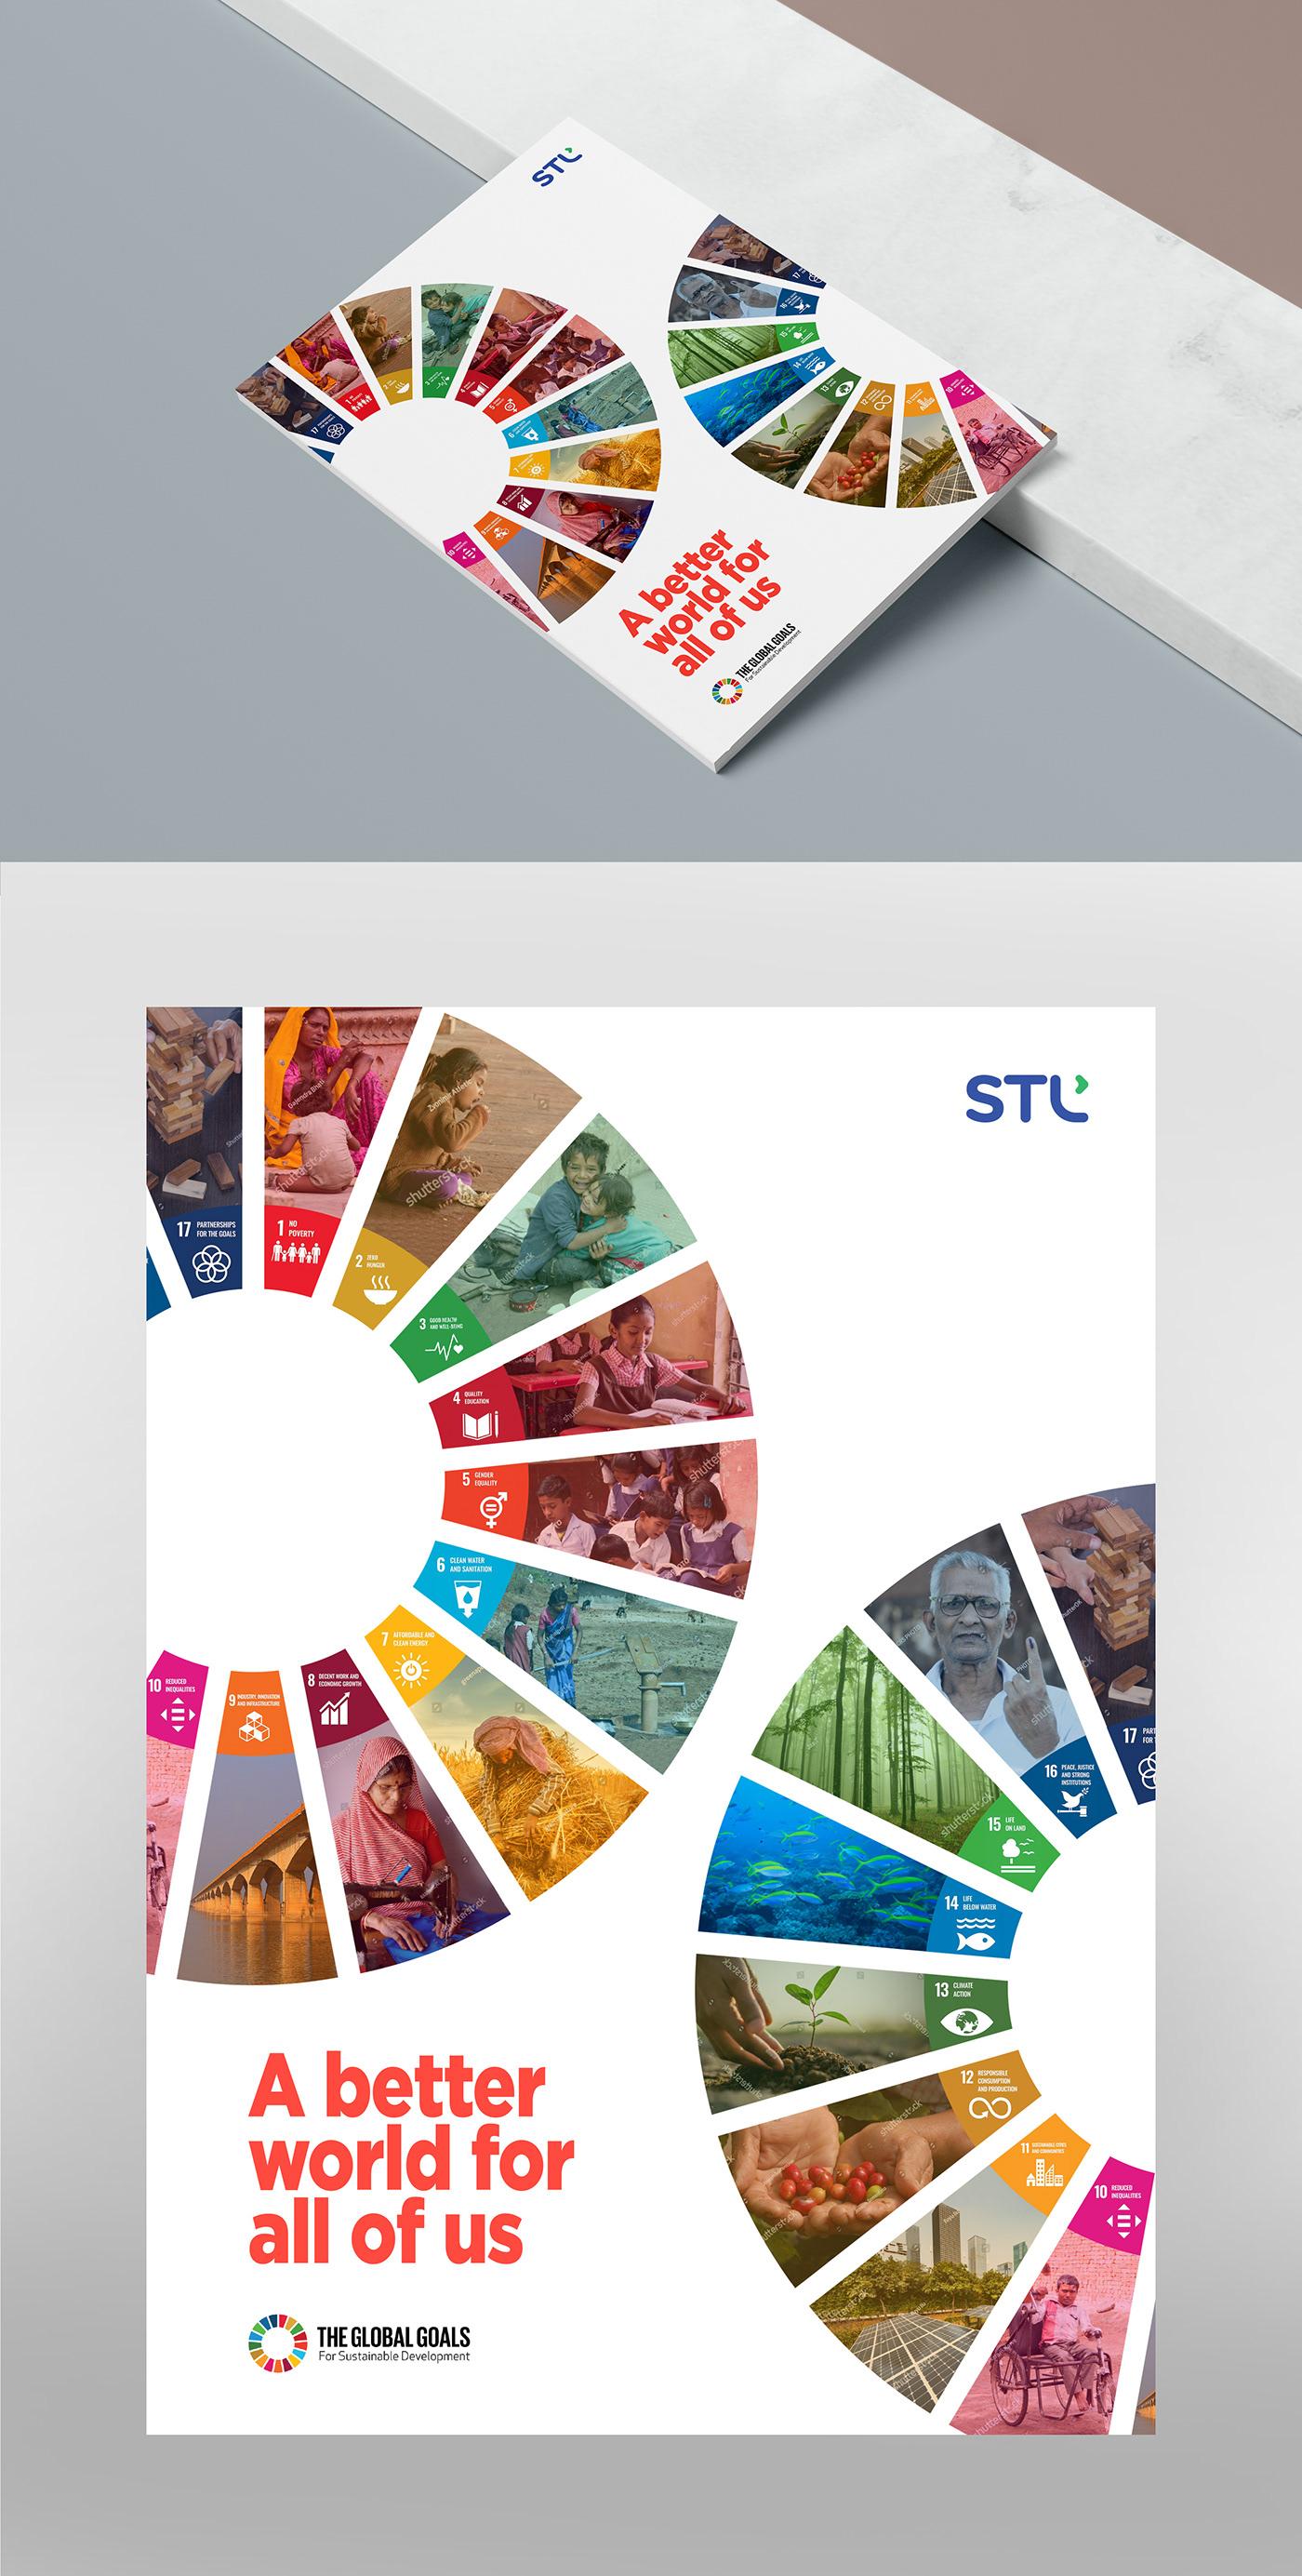 17 SDG 17 sustainable goals development goals Development Programme environment SDG Sustainable Development undp United Nations Goal world SDG